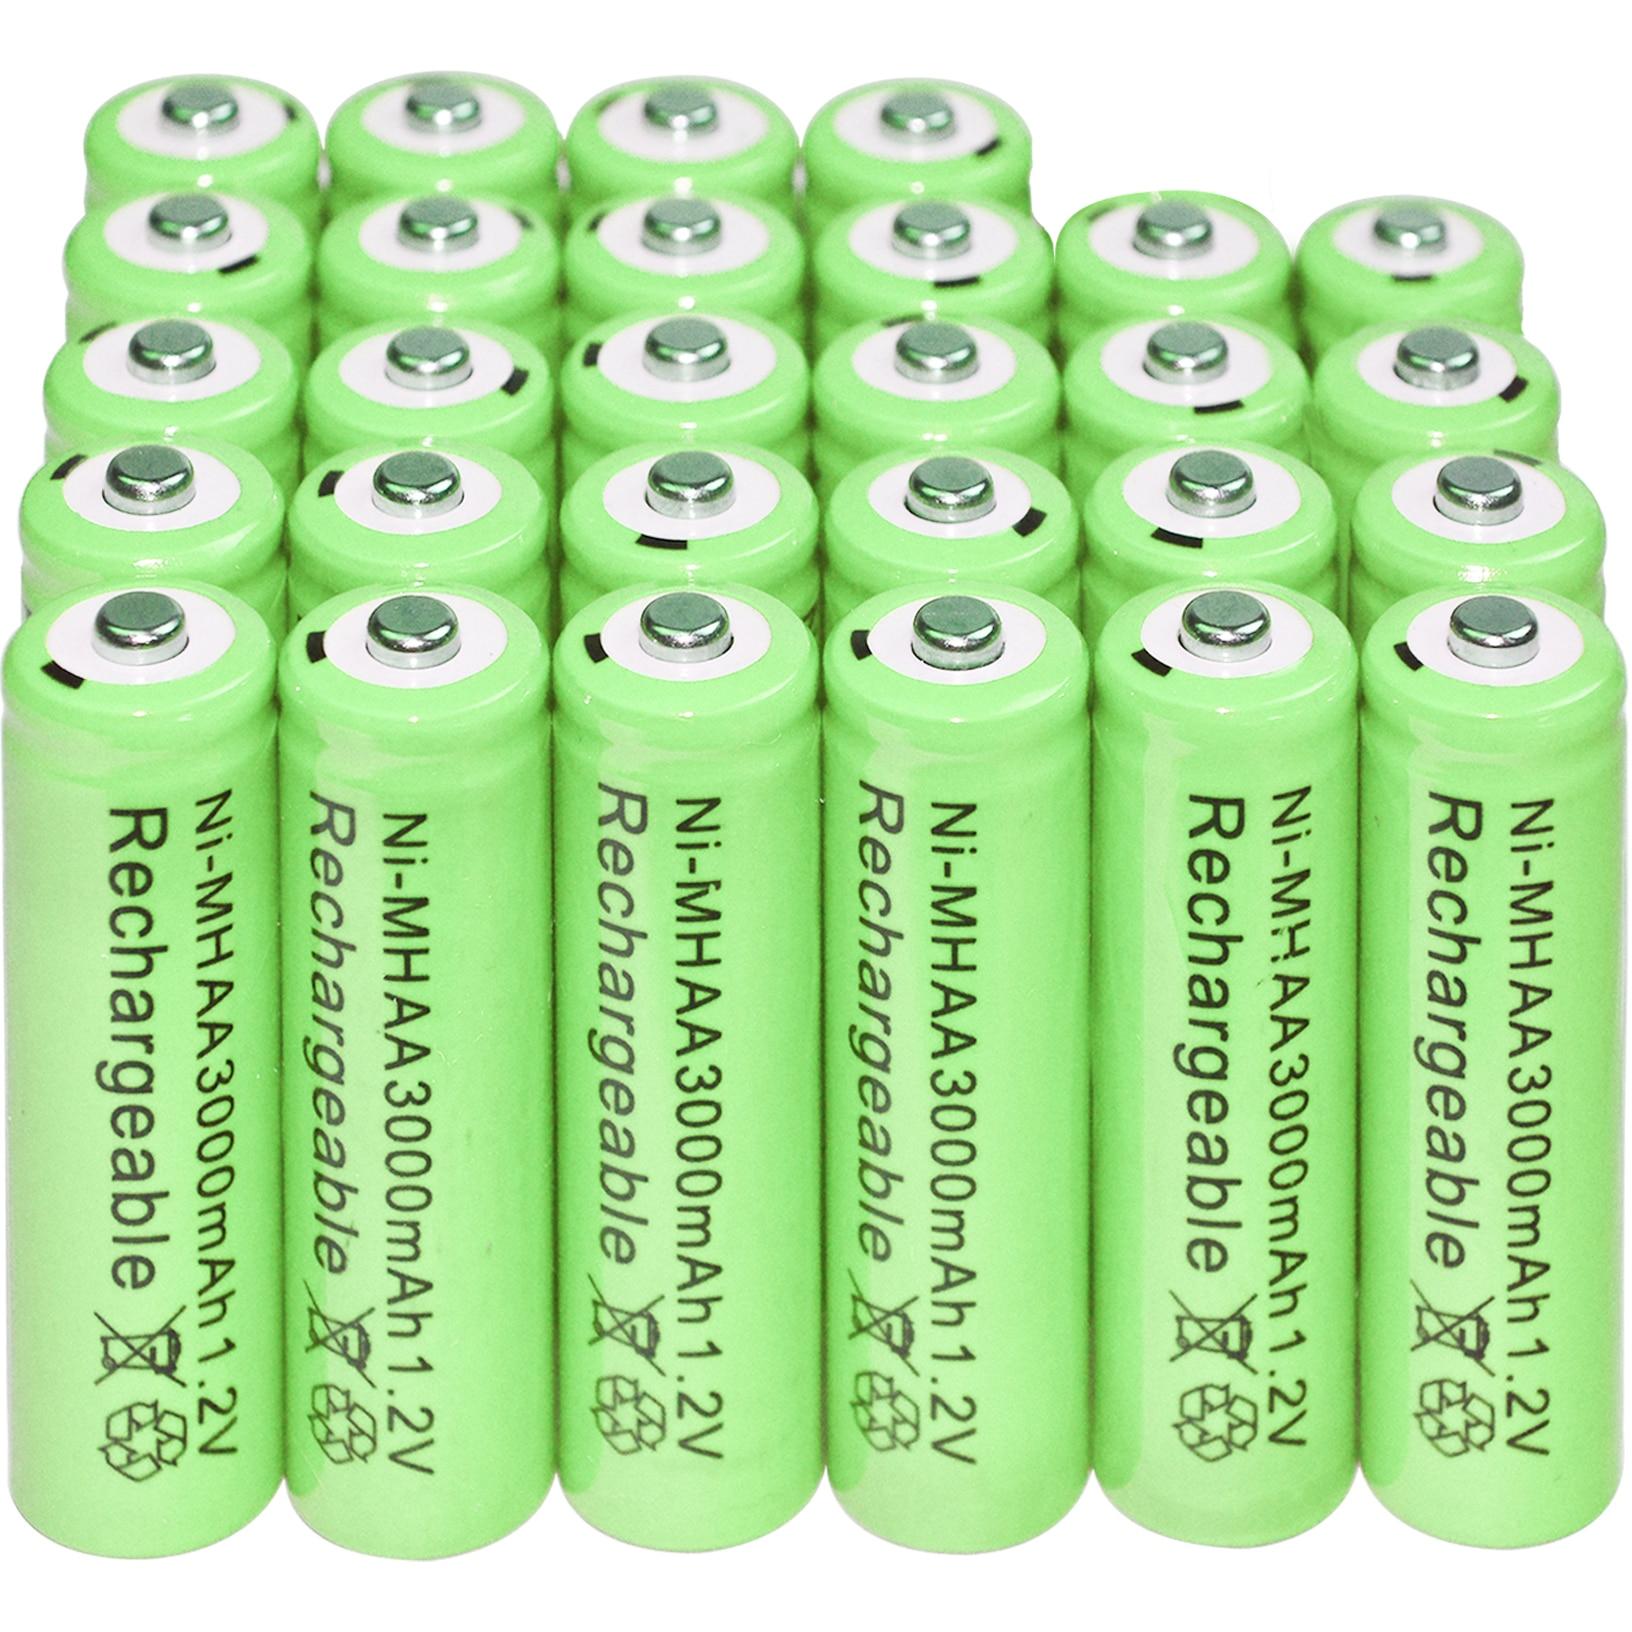 6/12/20/24/32/40pcs AA 1.2V 3000mAh NiMH 1.2v Rechargeable Batteries Green Battery Garden Solar Light LED Flashlight Torch